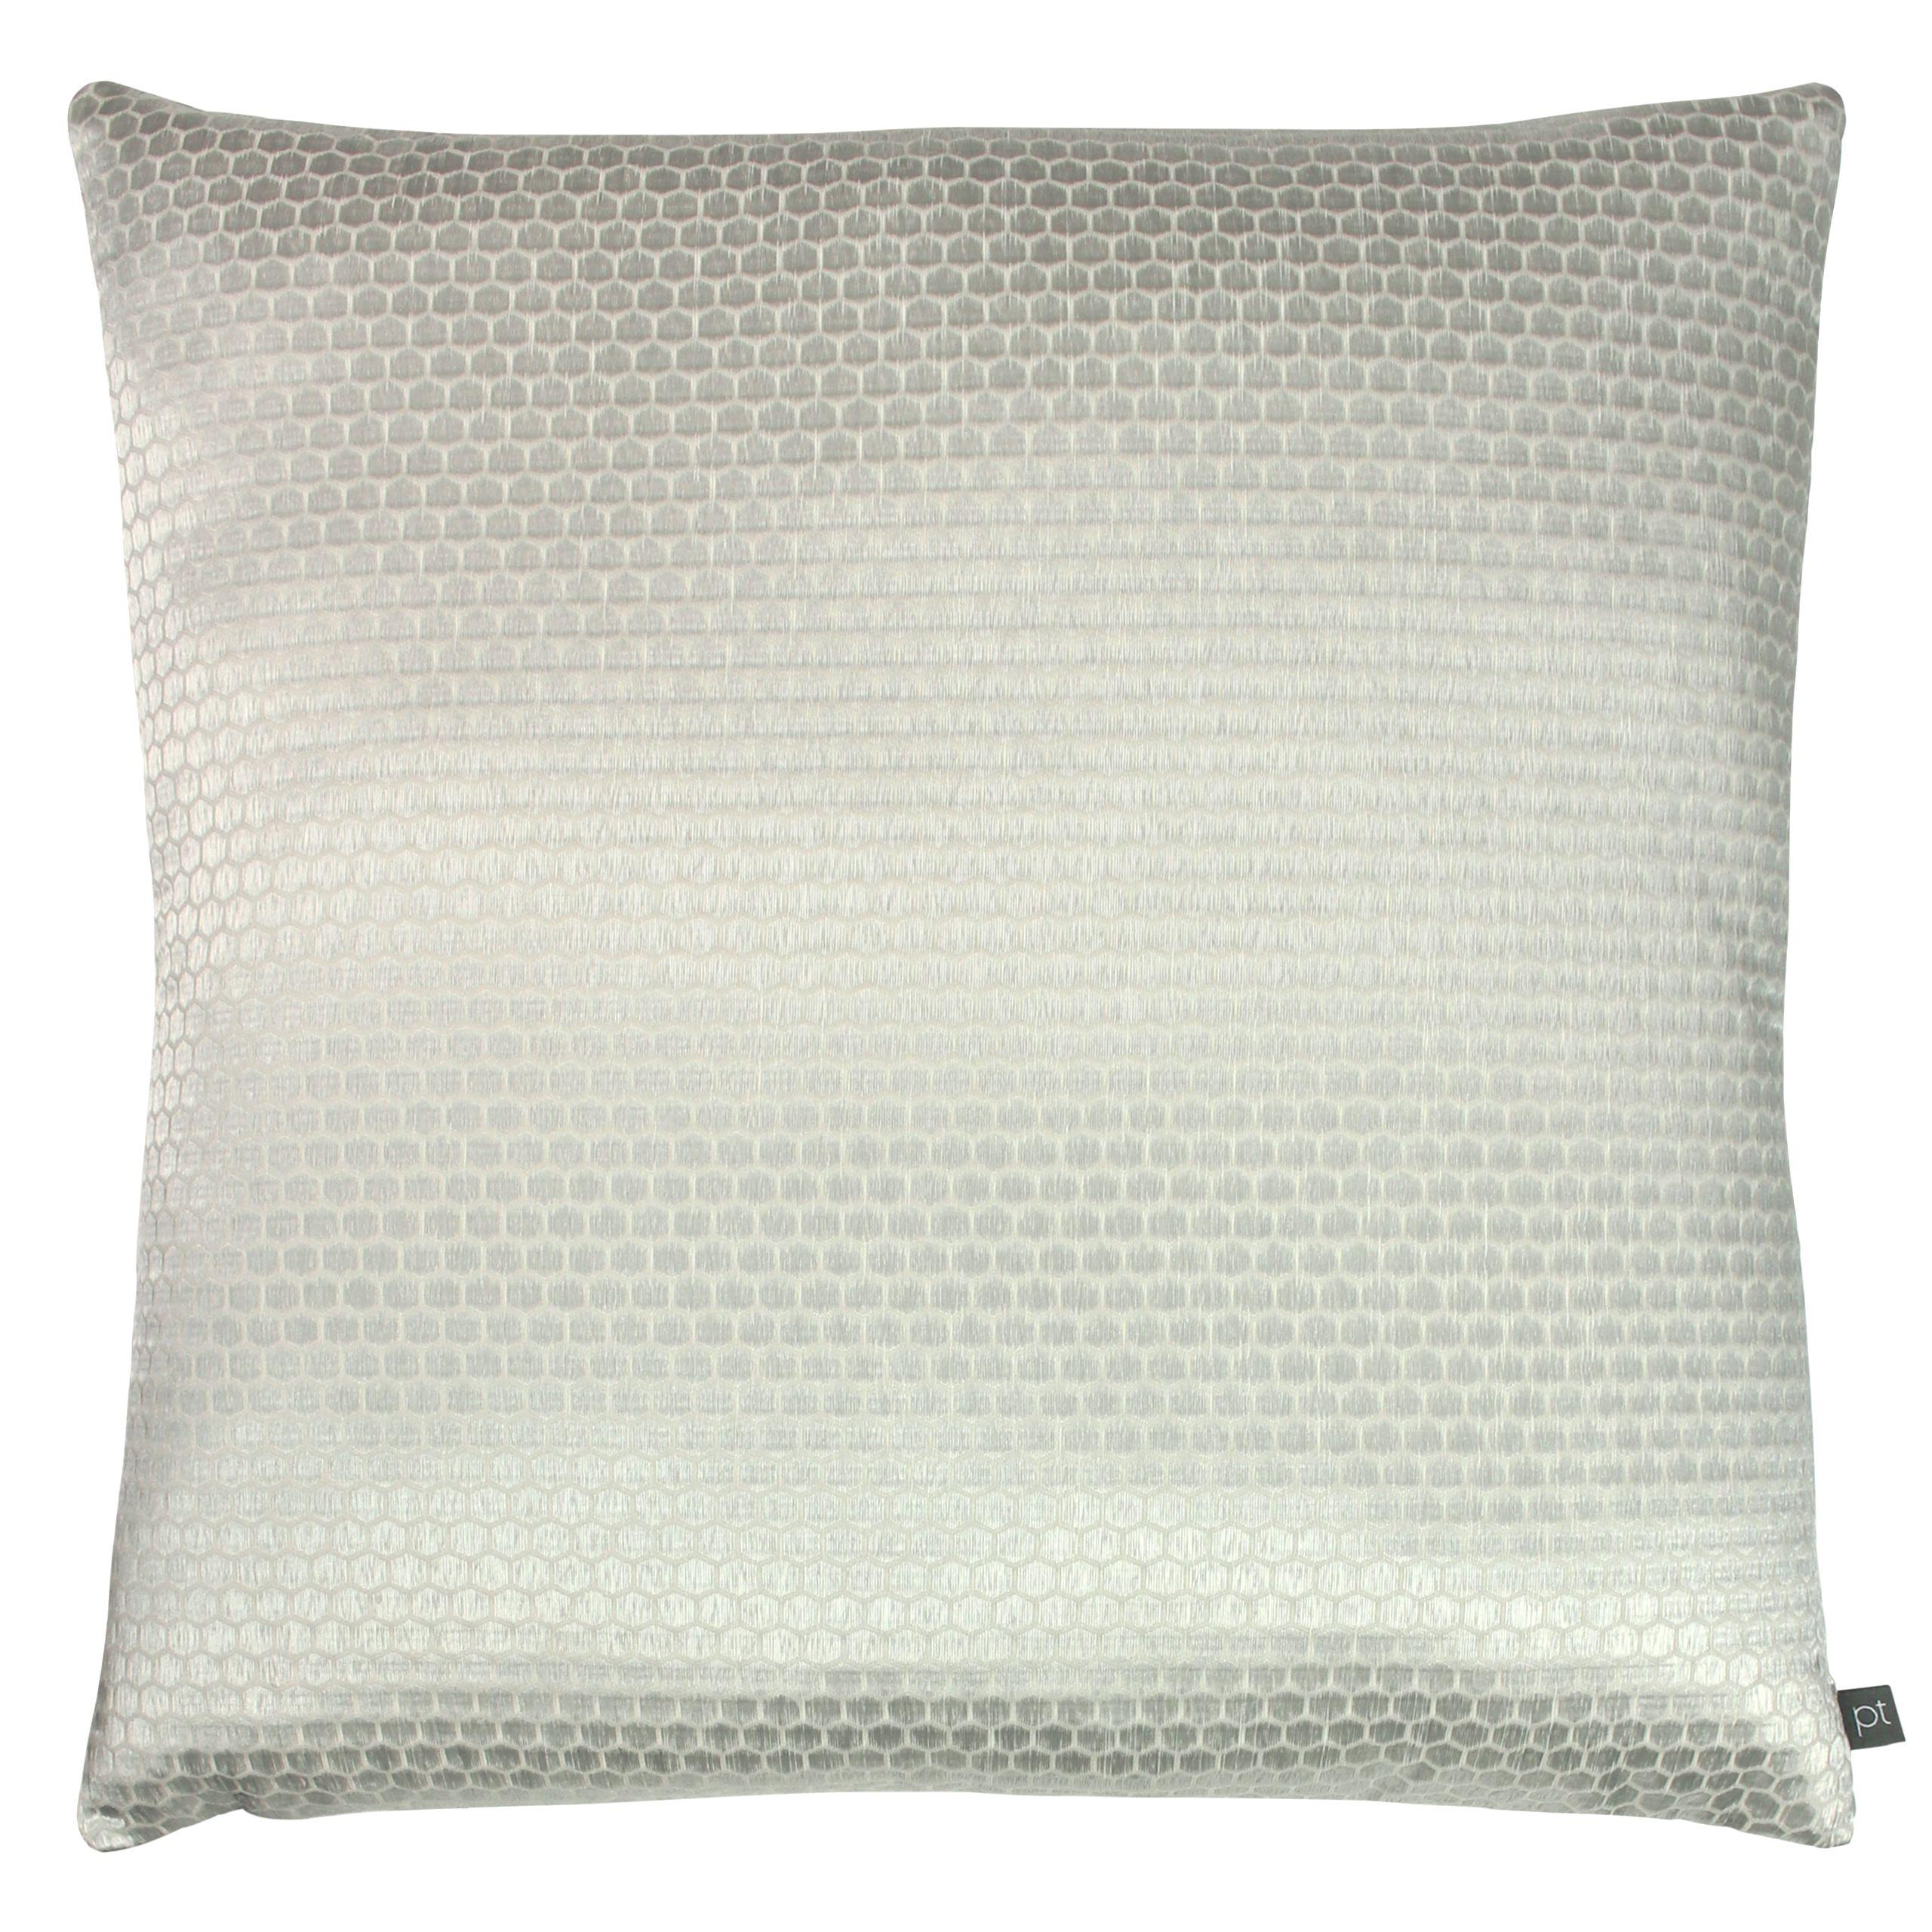 Prestigious Textiles Emboss Polyester Filled Cushion, Polyester, Cotton, Feather